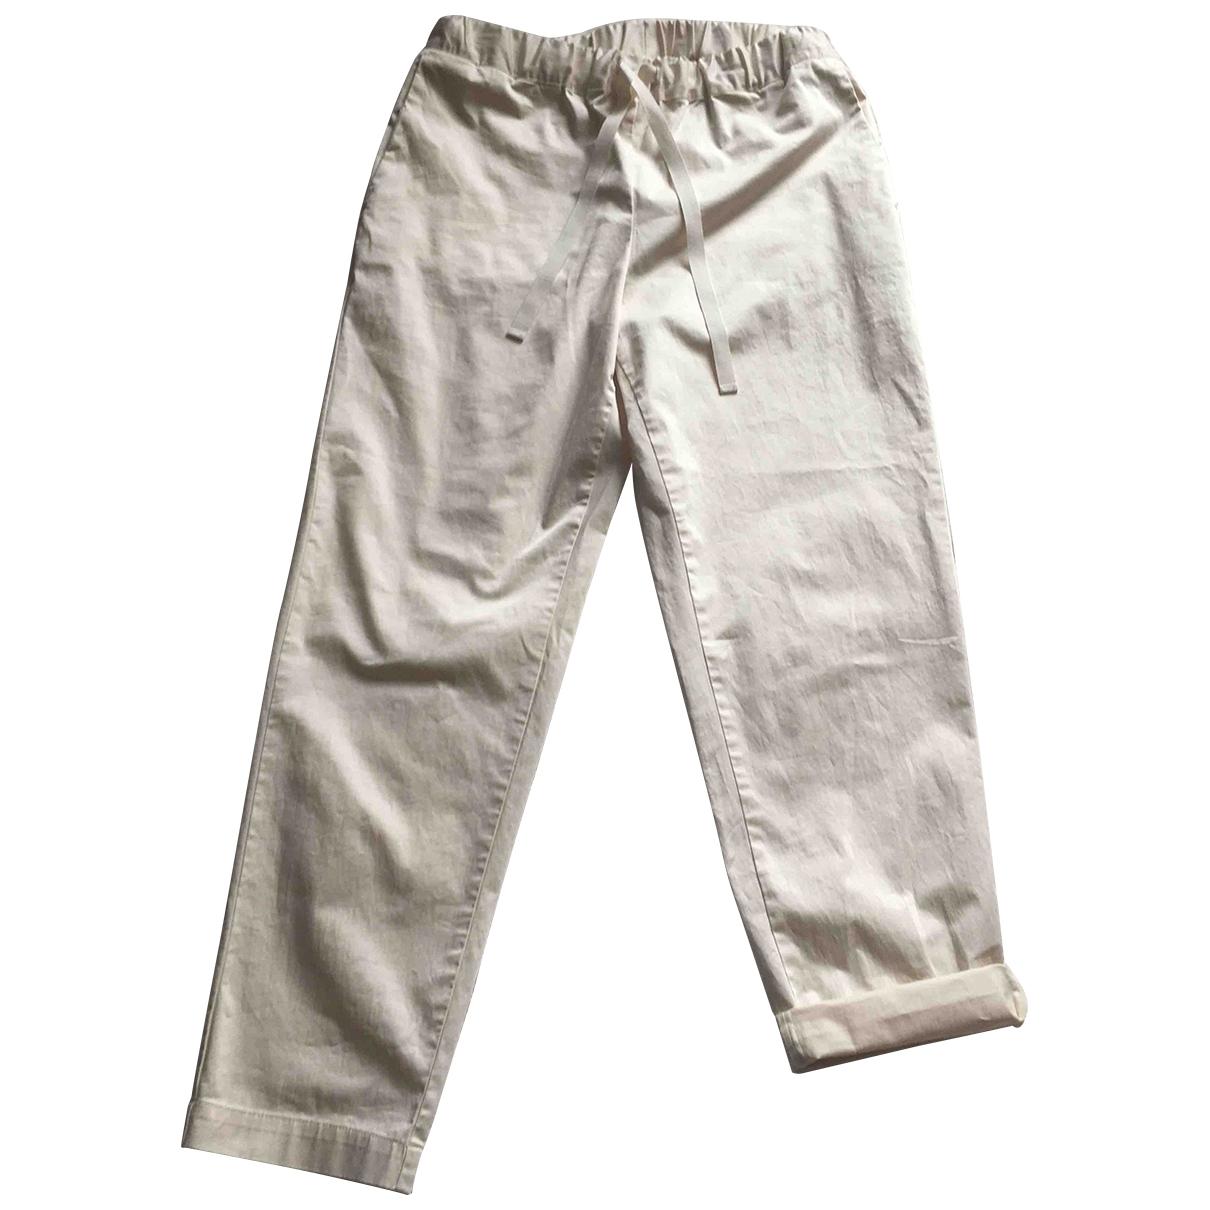 Pantalon en Algodon Crudo Semicouture